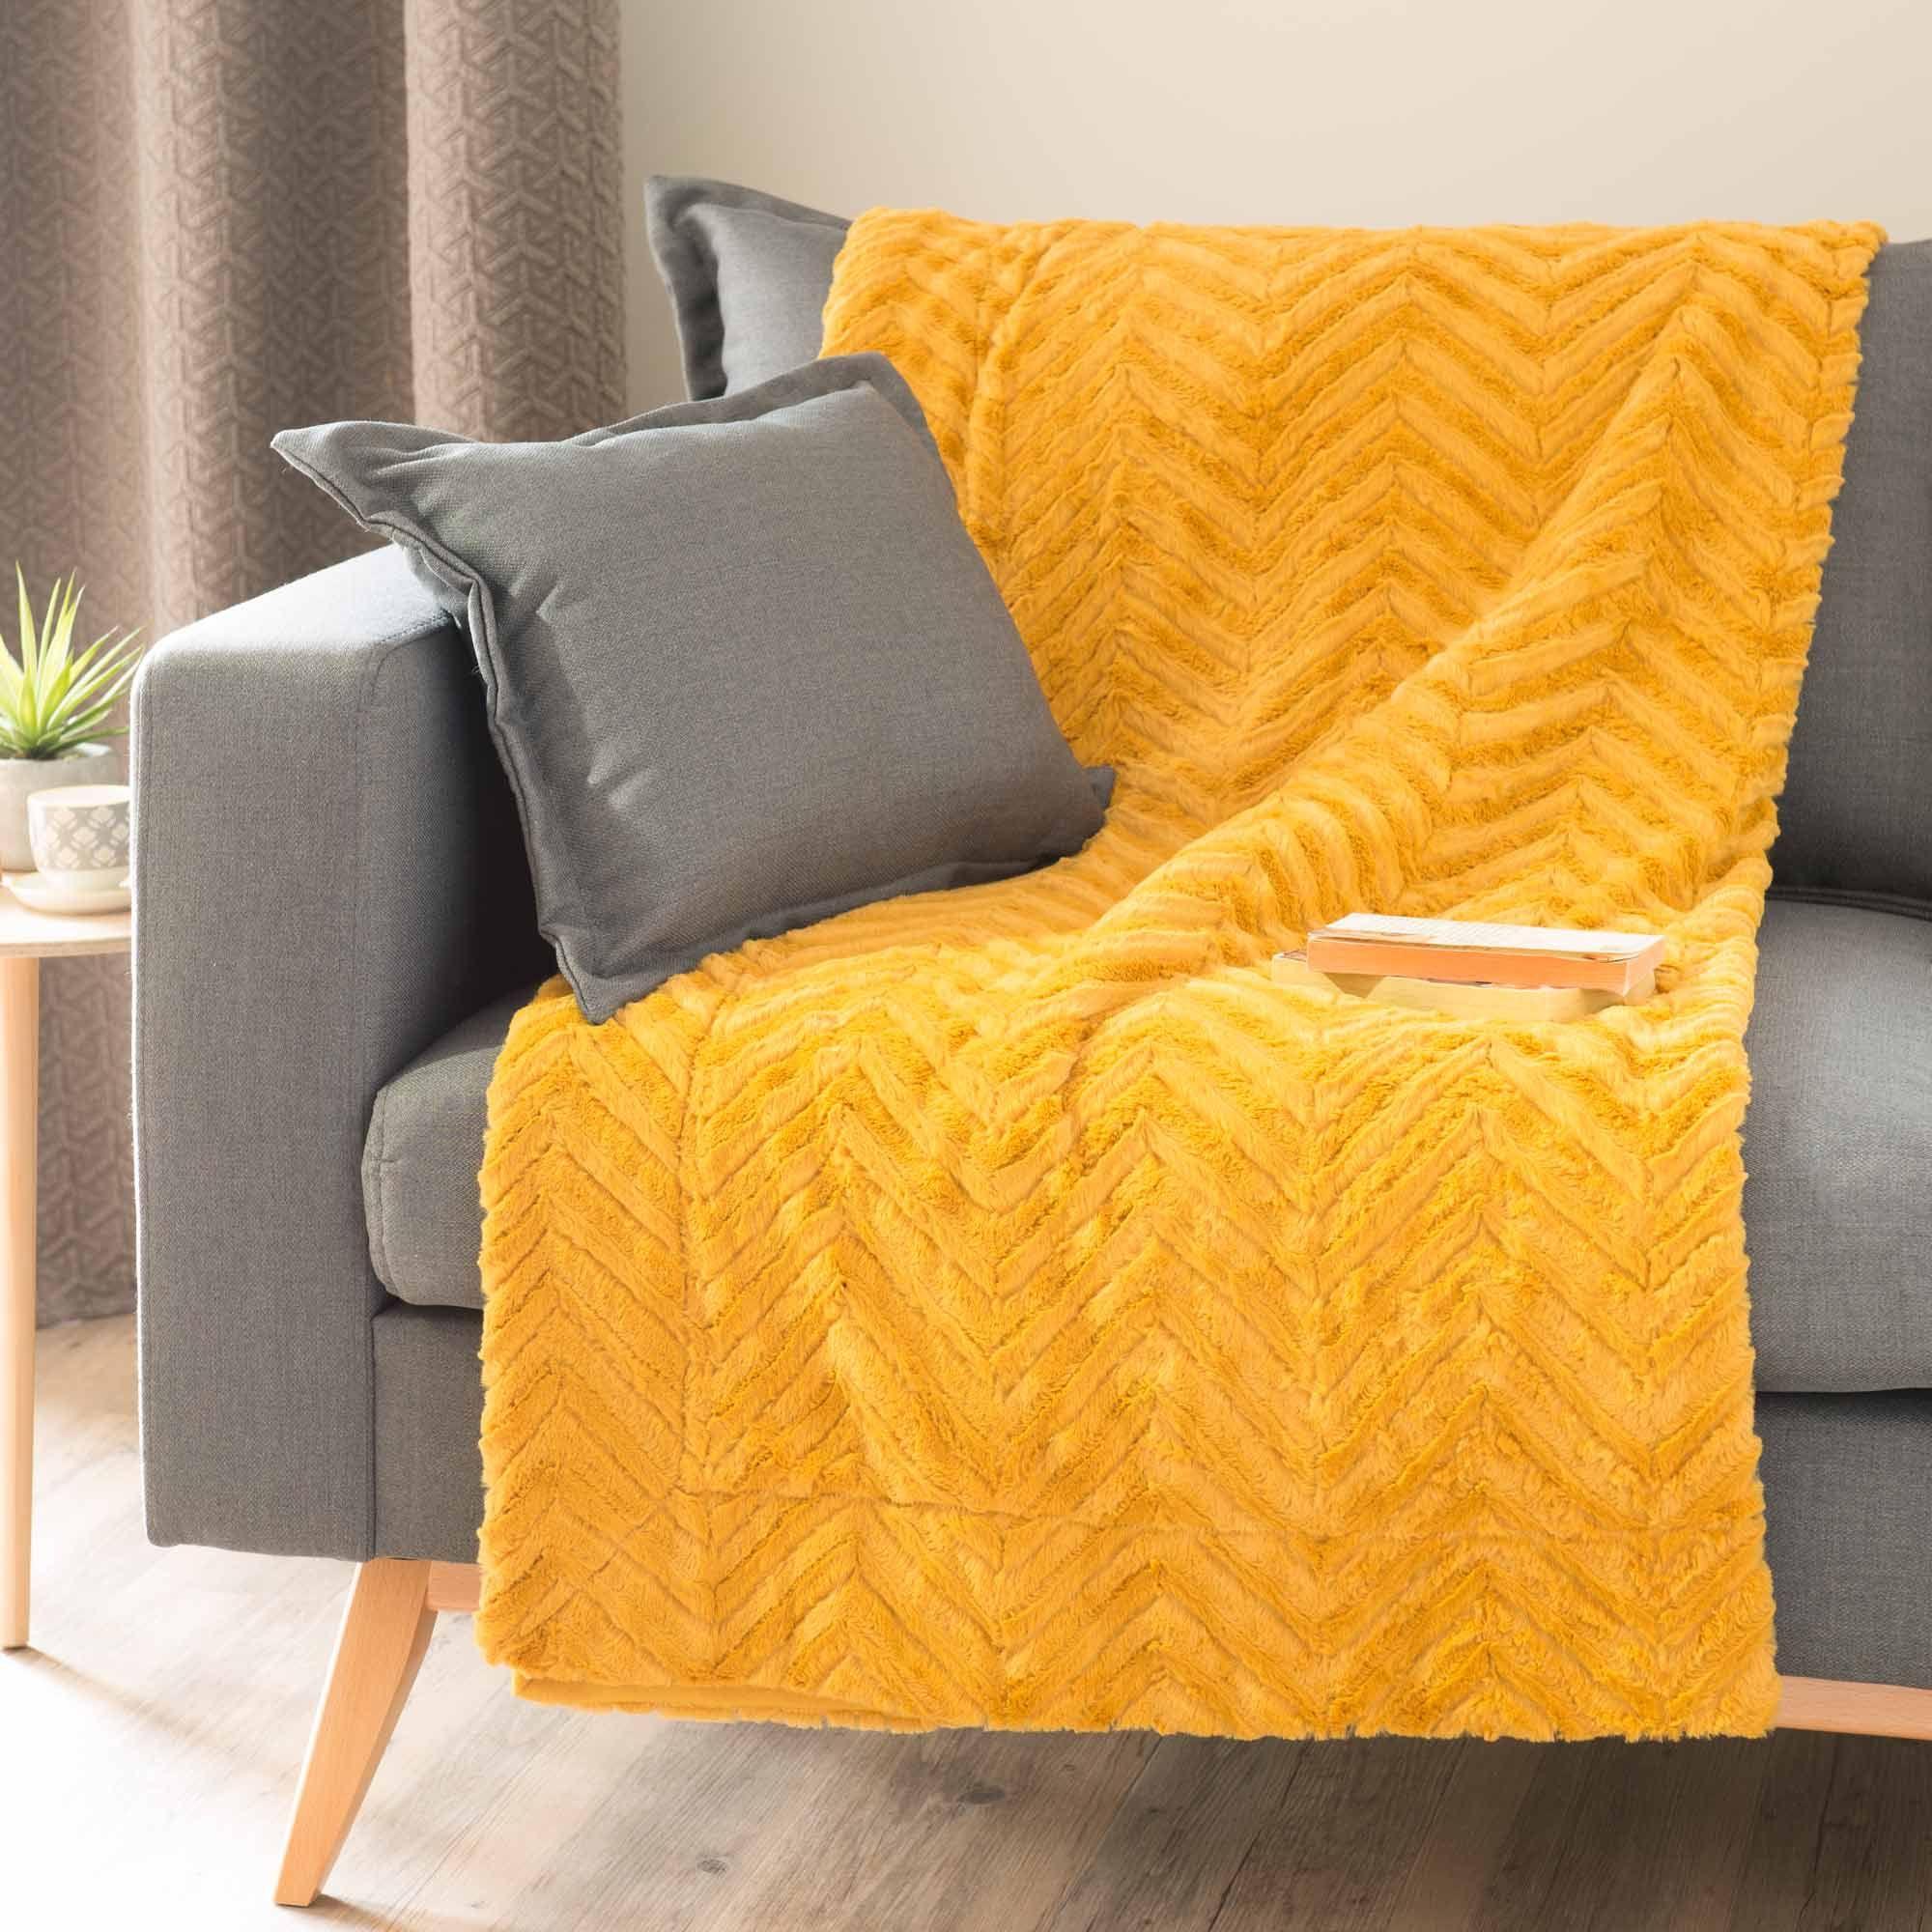 jet en fausse fourrure jaune moutarde 130 x 170 cm. Black Bedroom Furniture Sets. Home Design Ideas